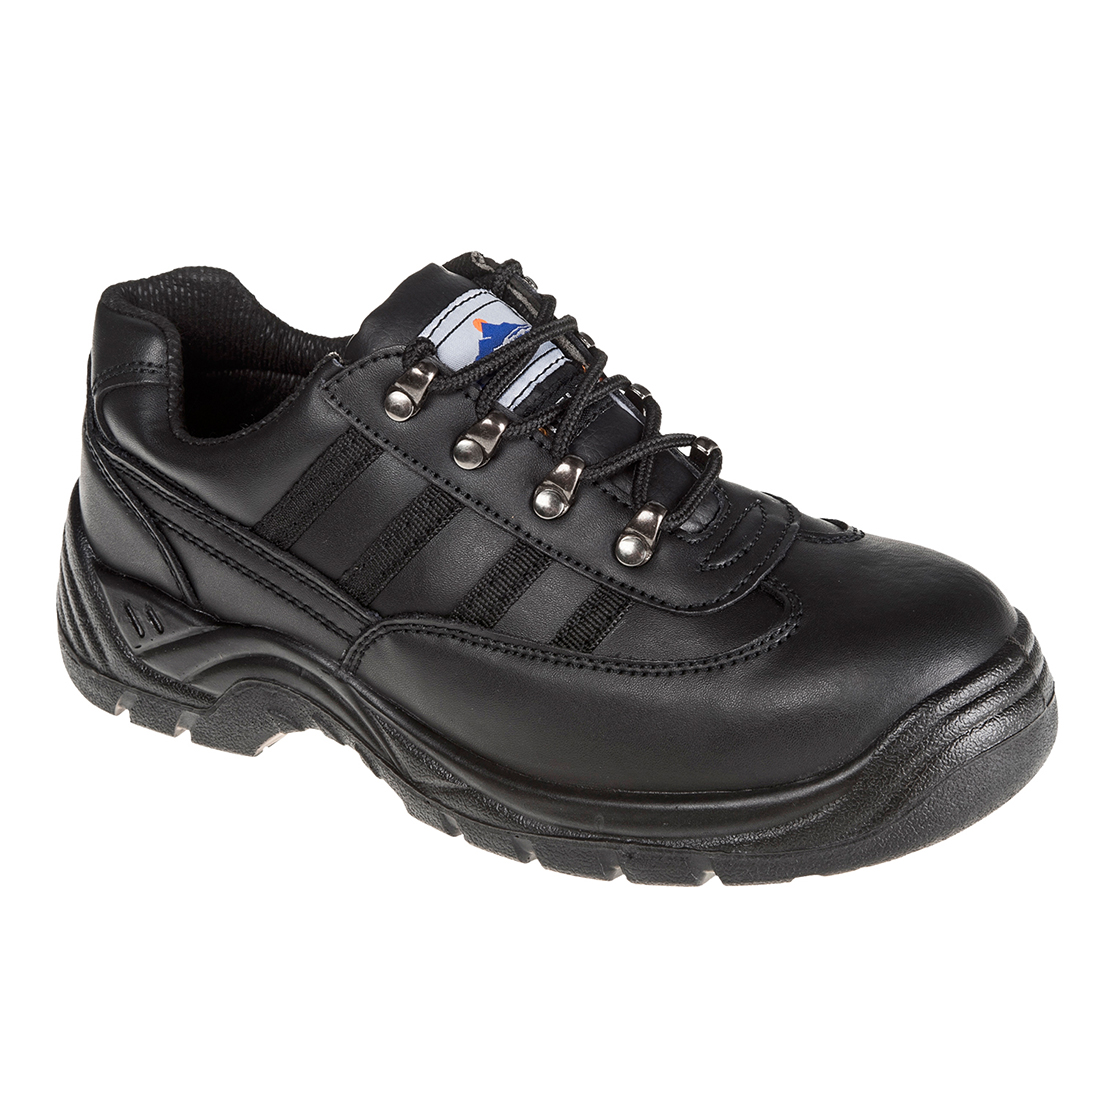 Safety Trainer 37/4 S1 Black 37